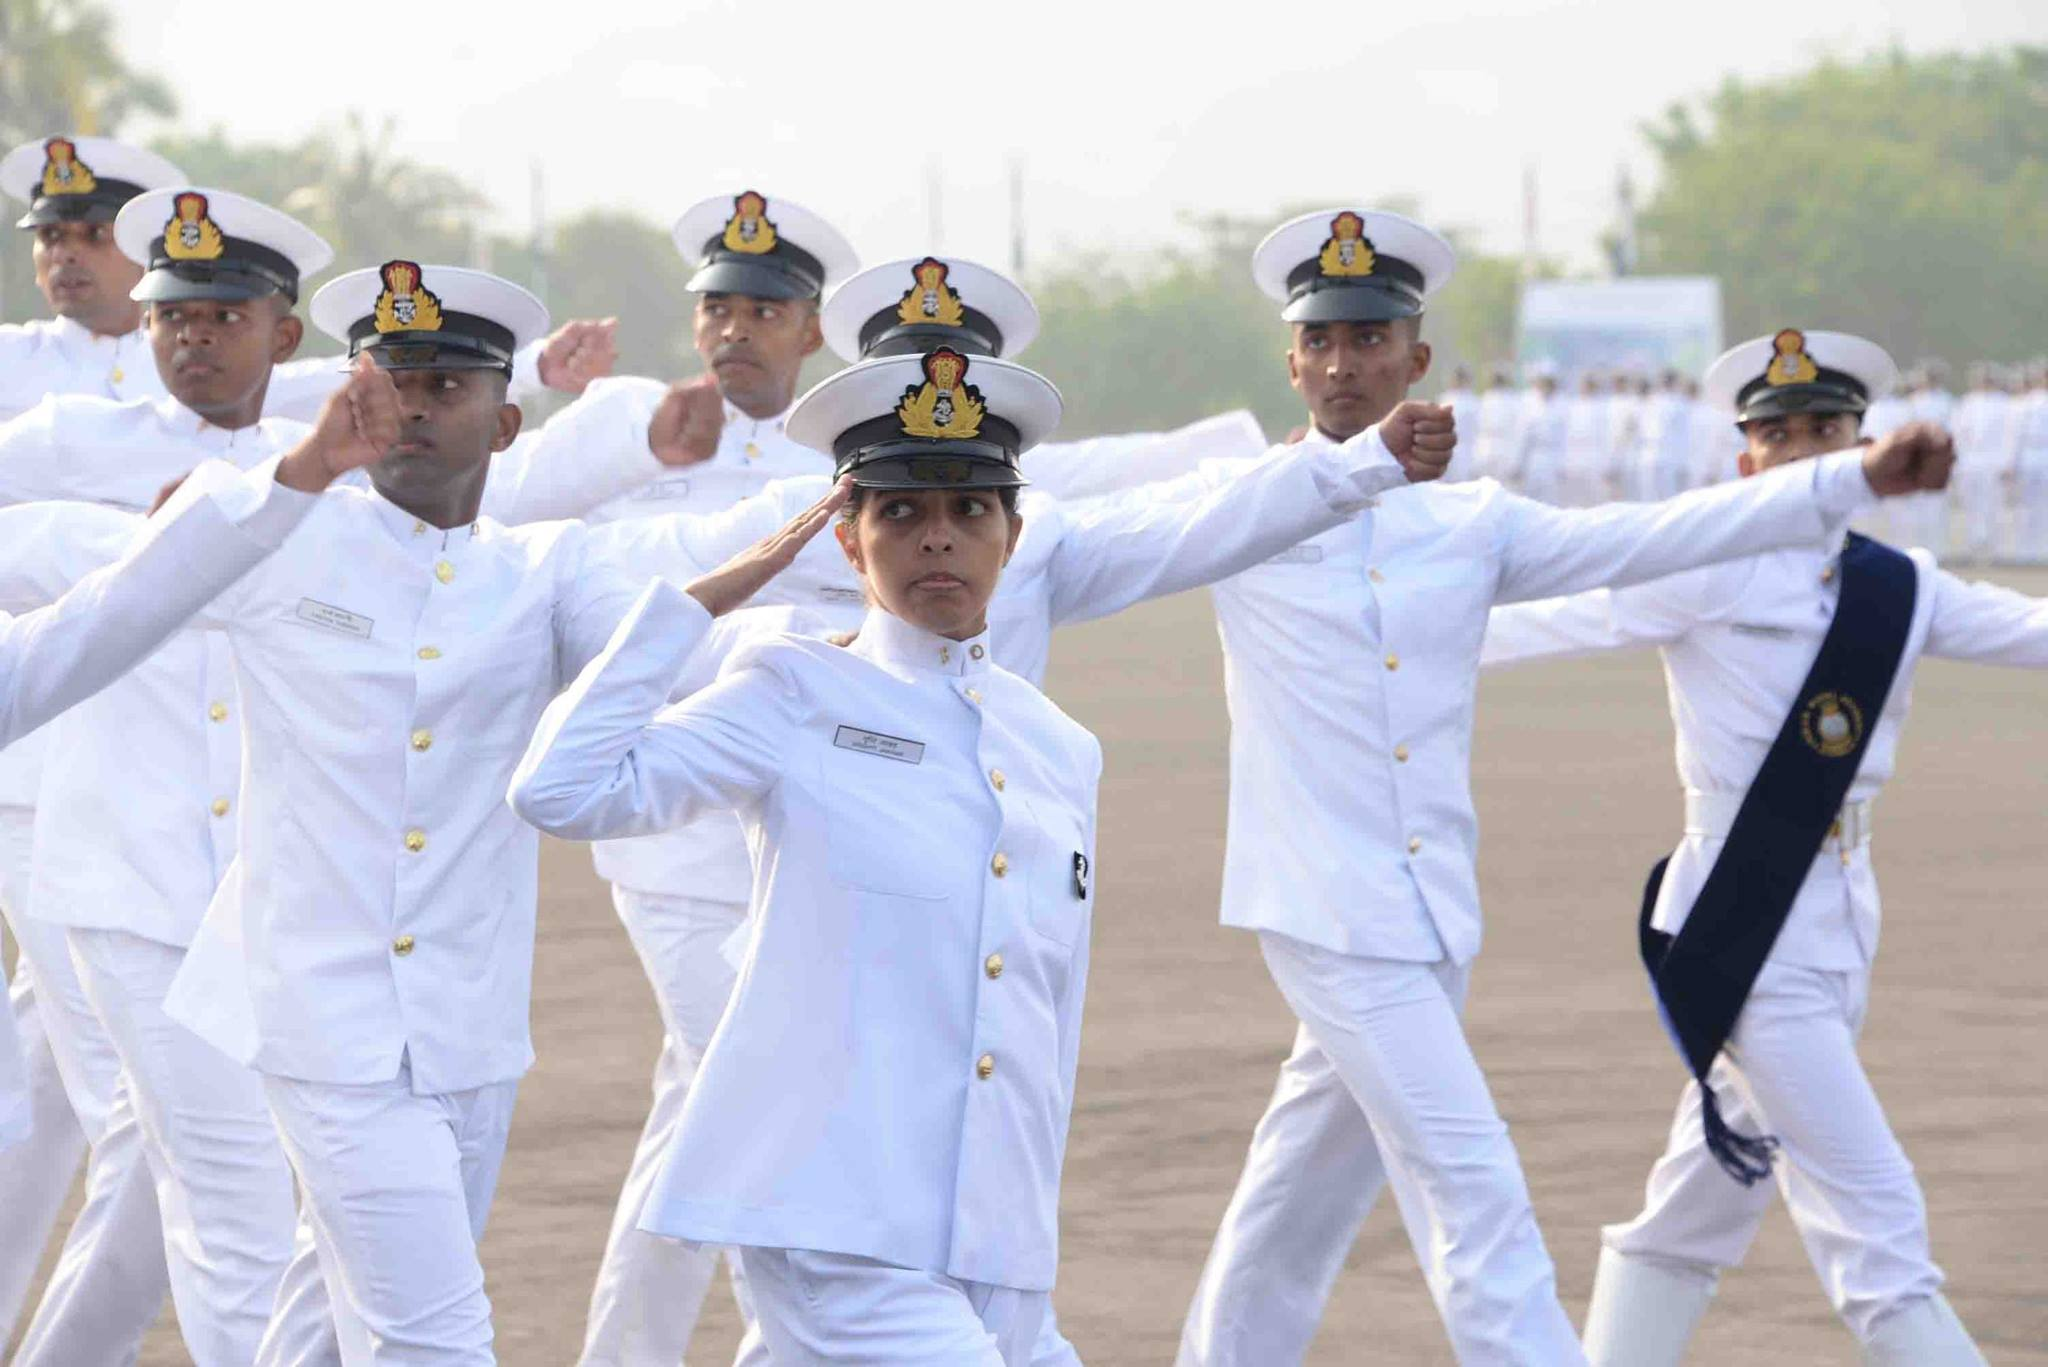 Marina indiana dopo il decimo